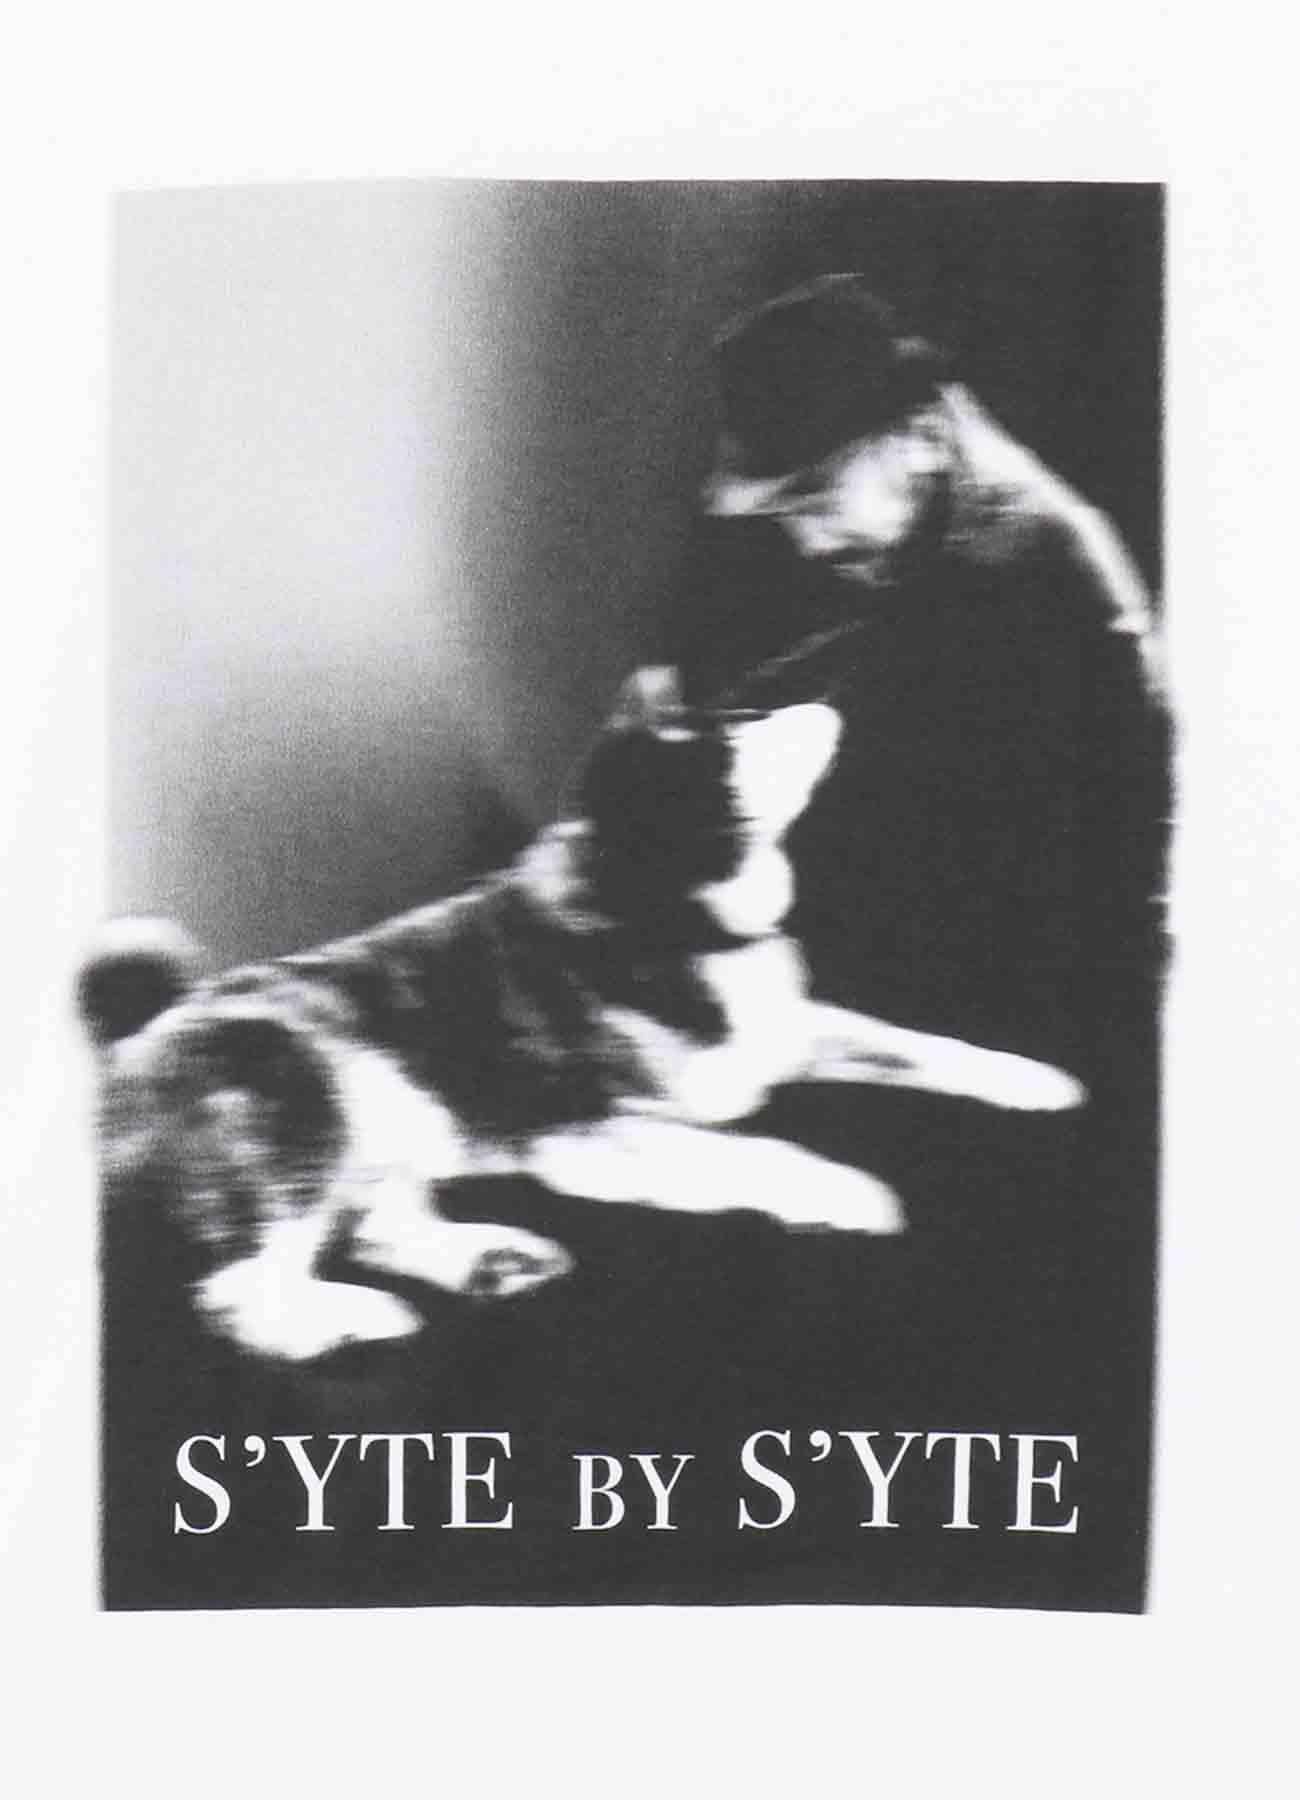 S'YTE 10TH「S'YTE BY S'YTE」STARE AT EACH OTHER YY T-SHIRT